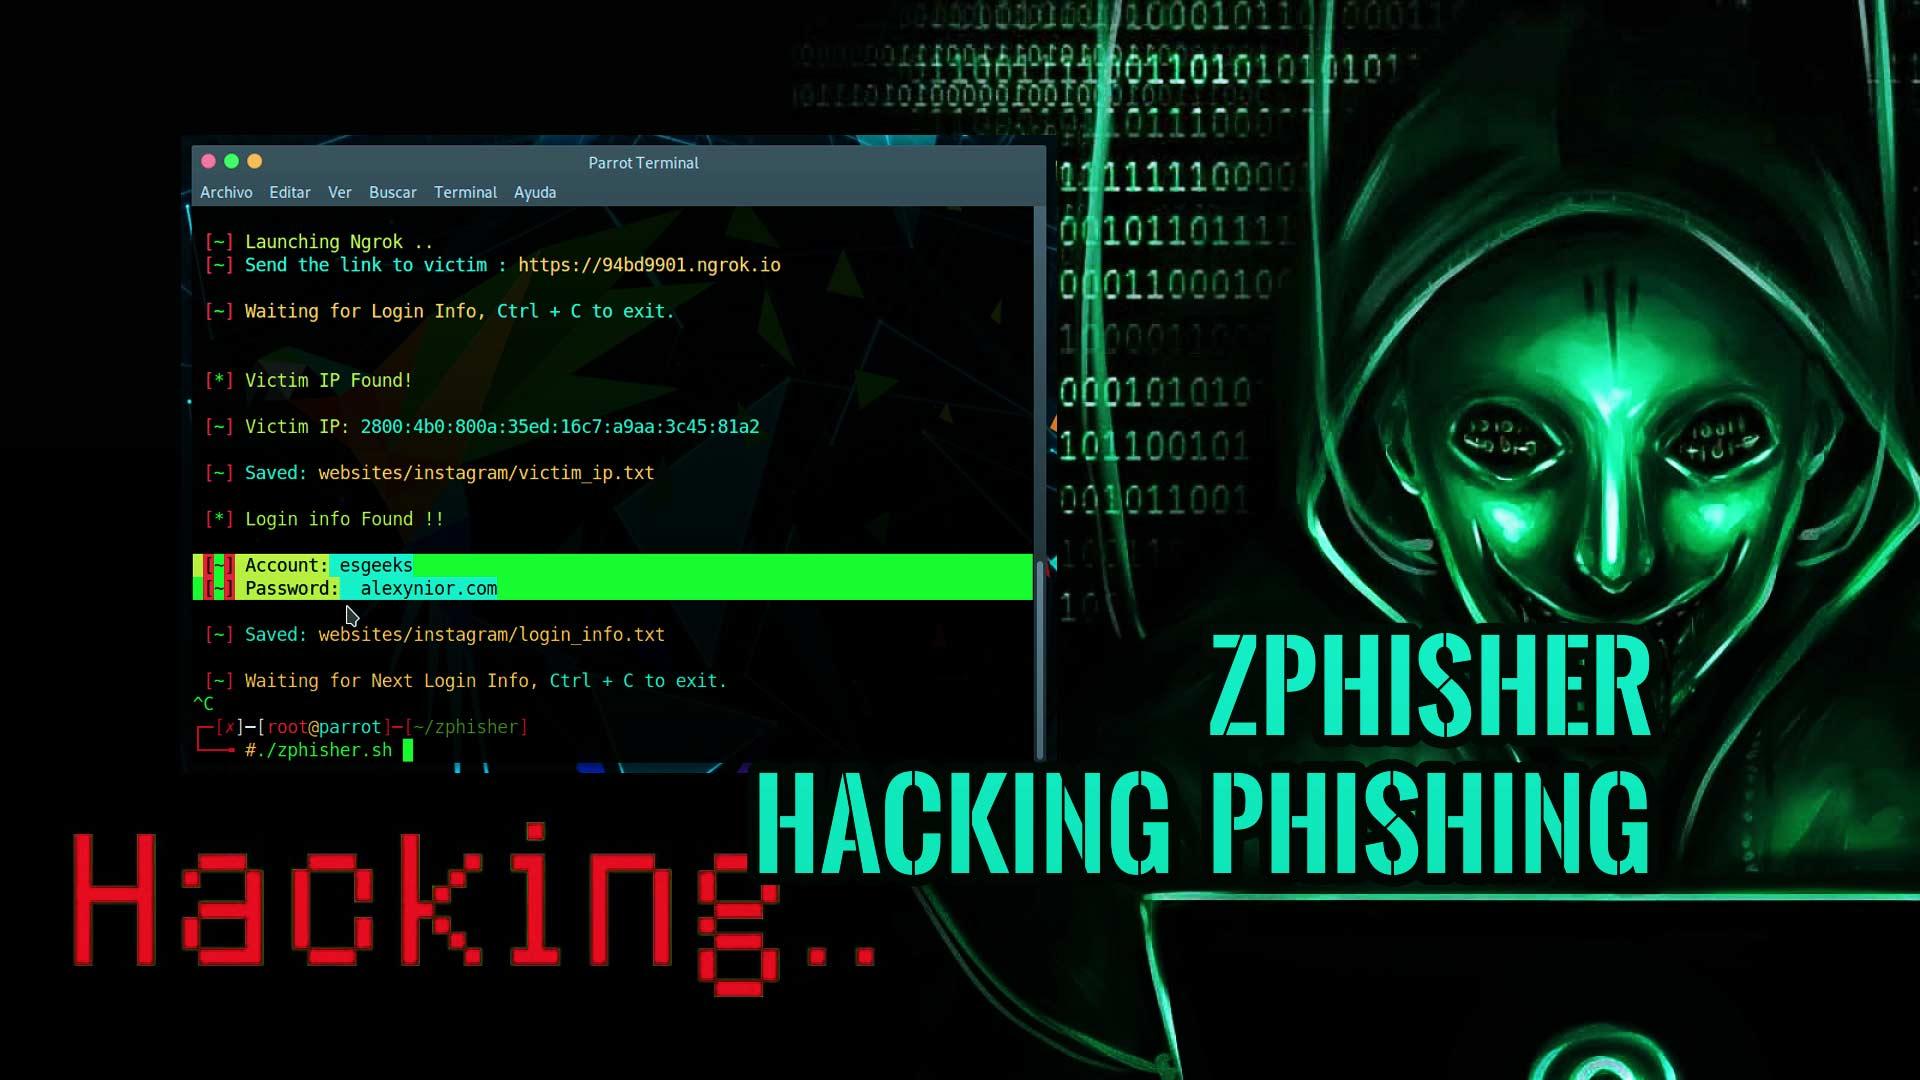 Zphisher: Herramienta de phishing automatizada